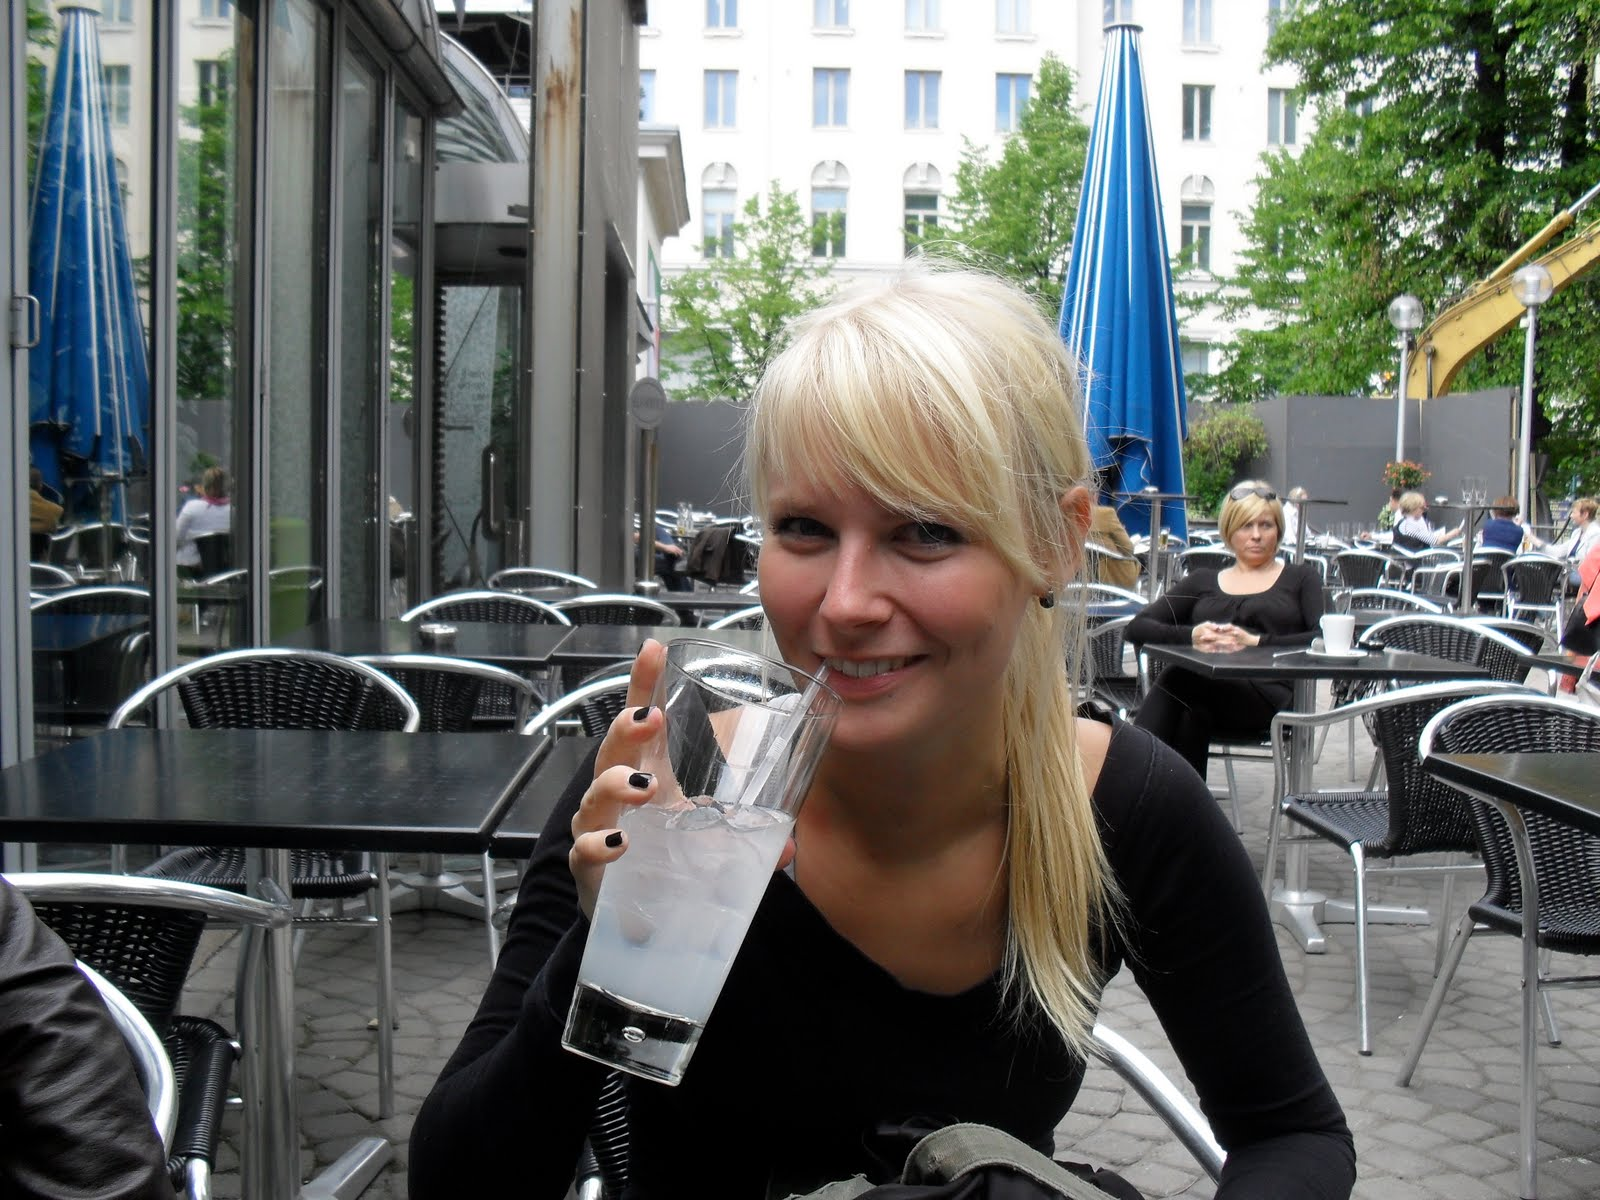 hoshino-true-finnish-pussy-punk-photos